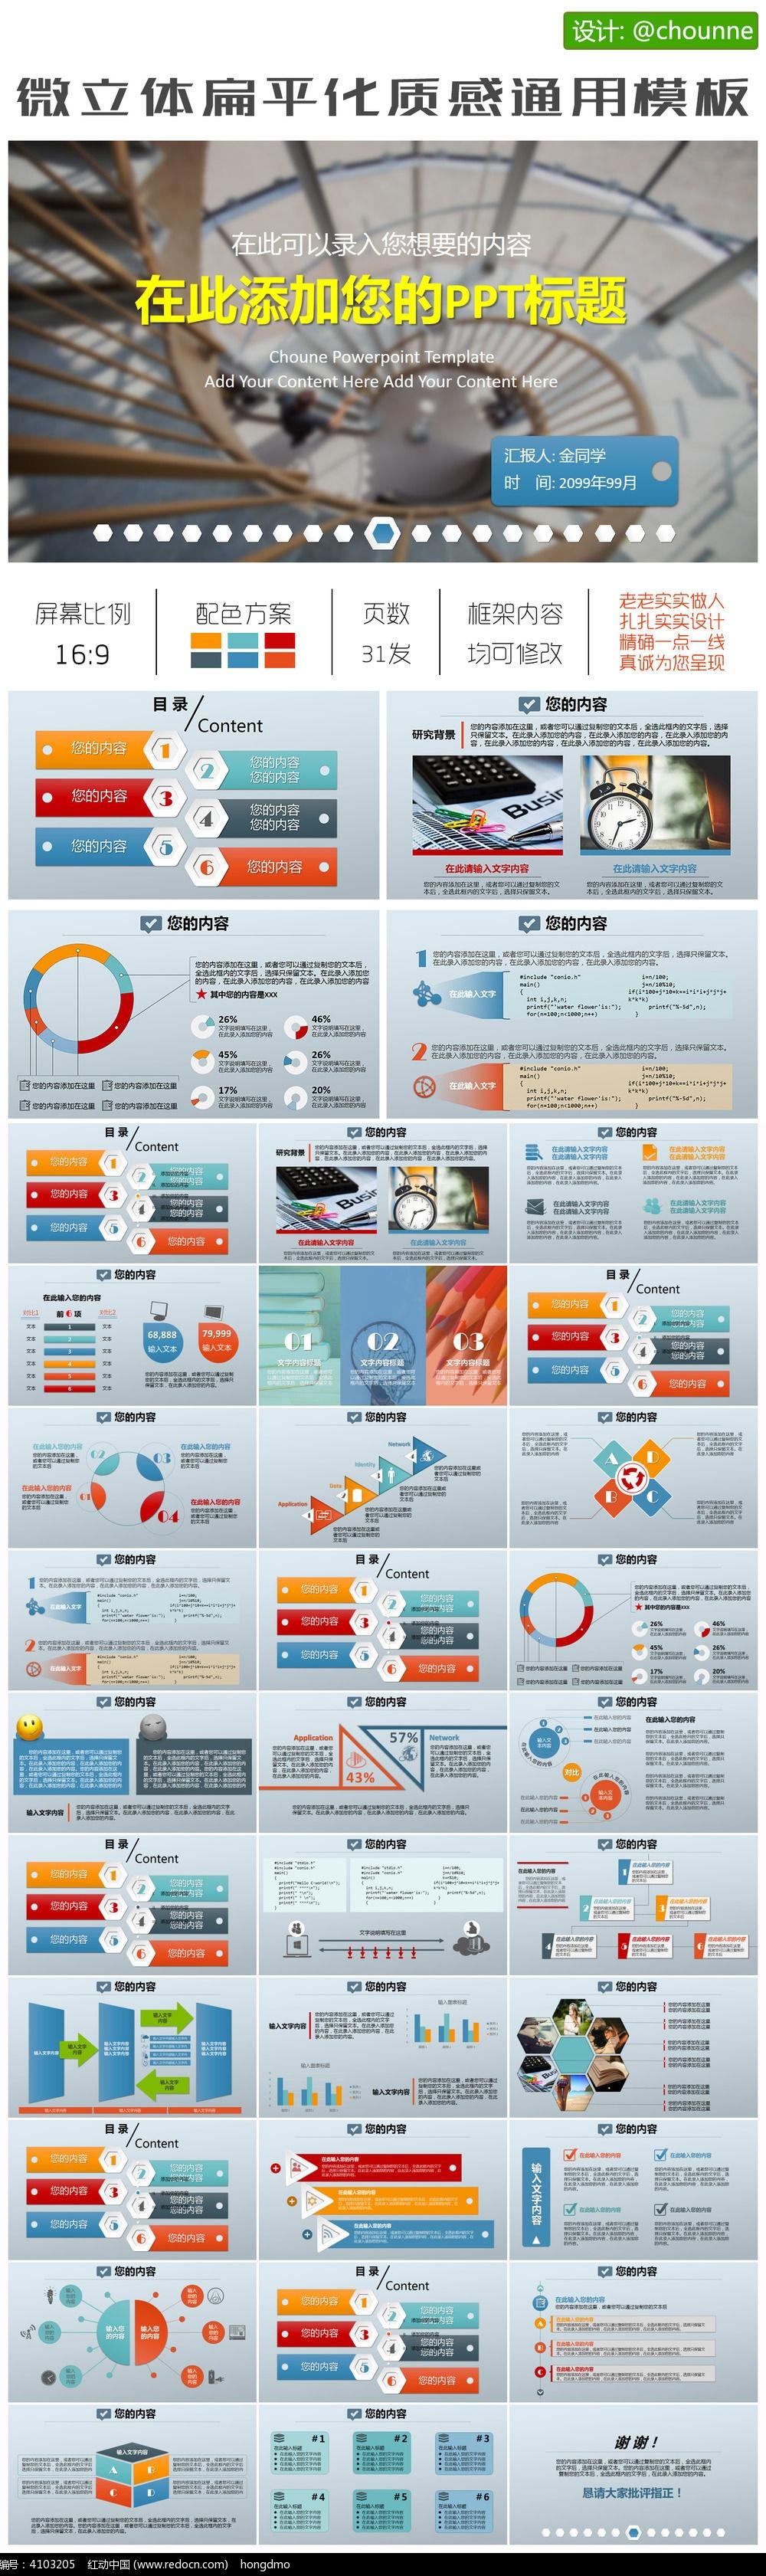 PPT图表模板 精美PPT 报告 创意 动态ppt 工作汇报 工作计划 会议